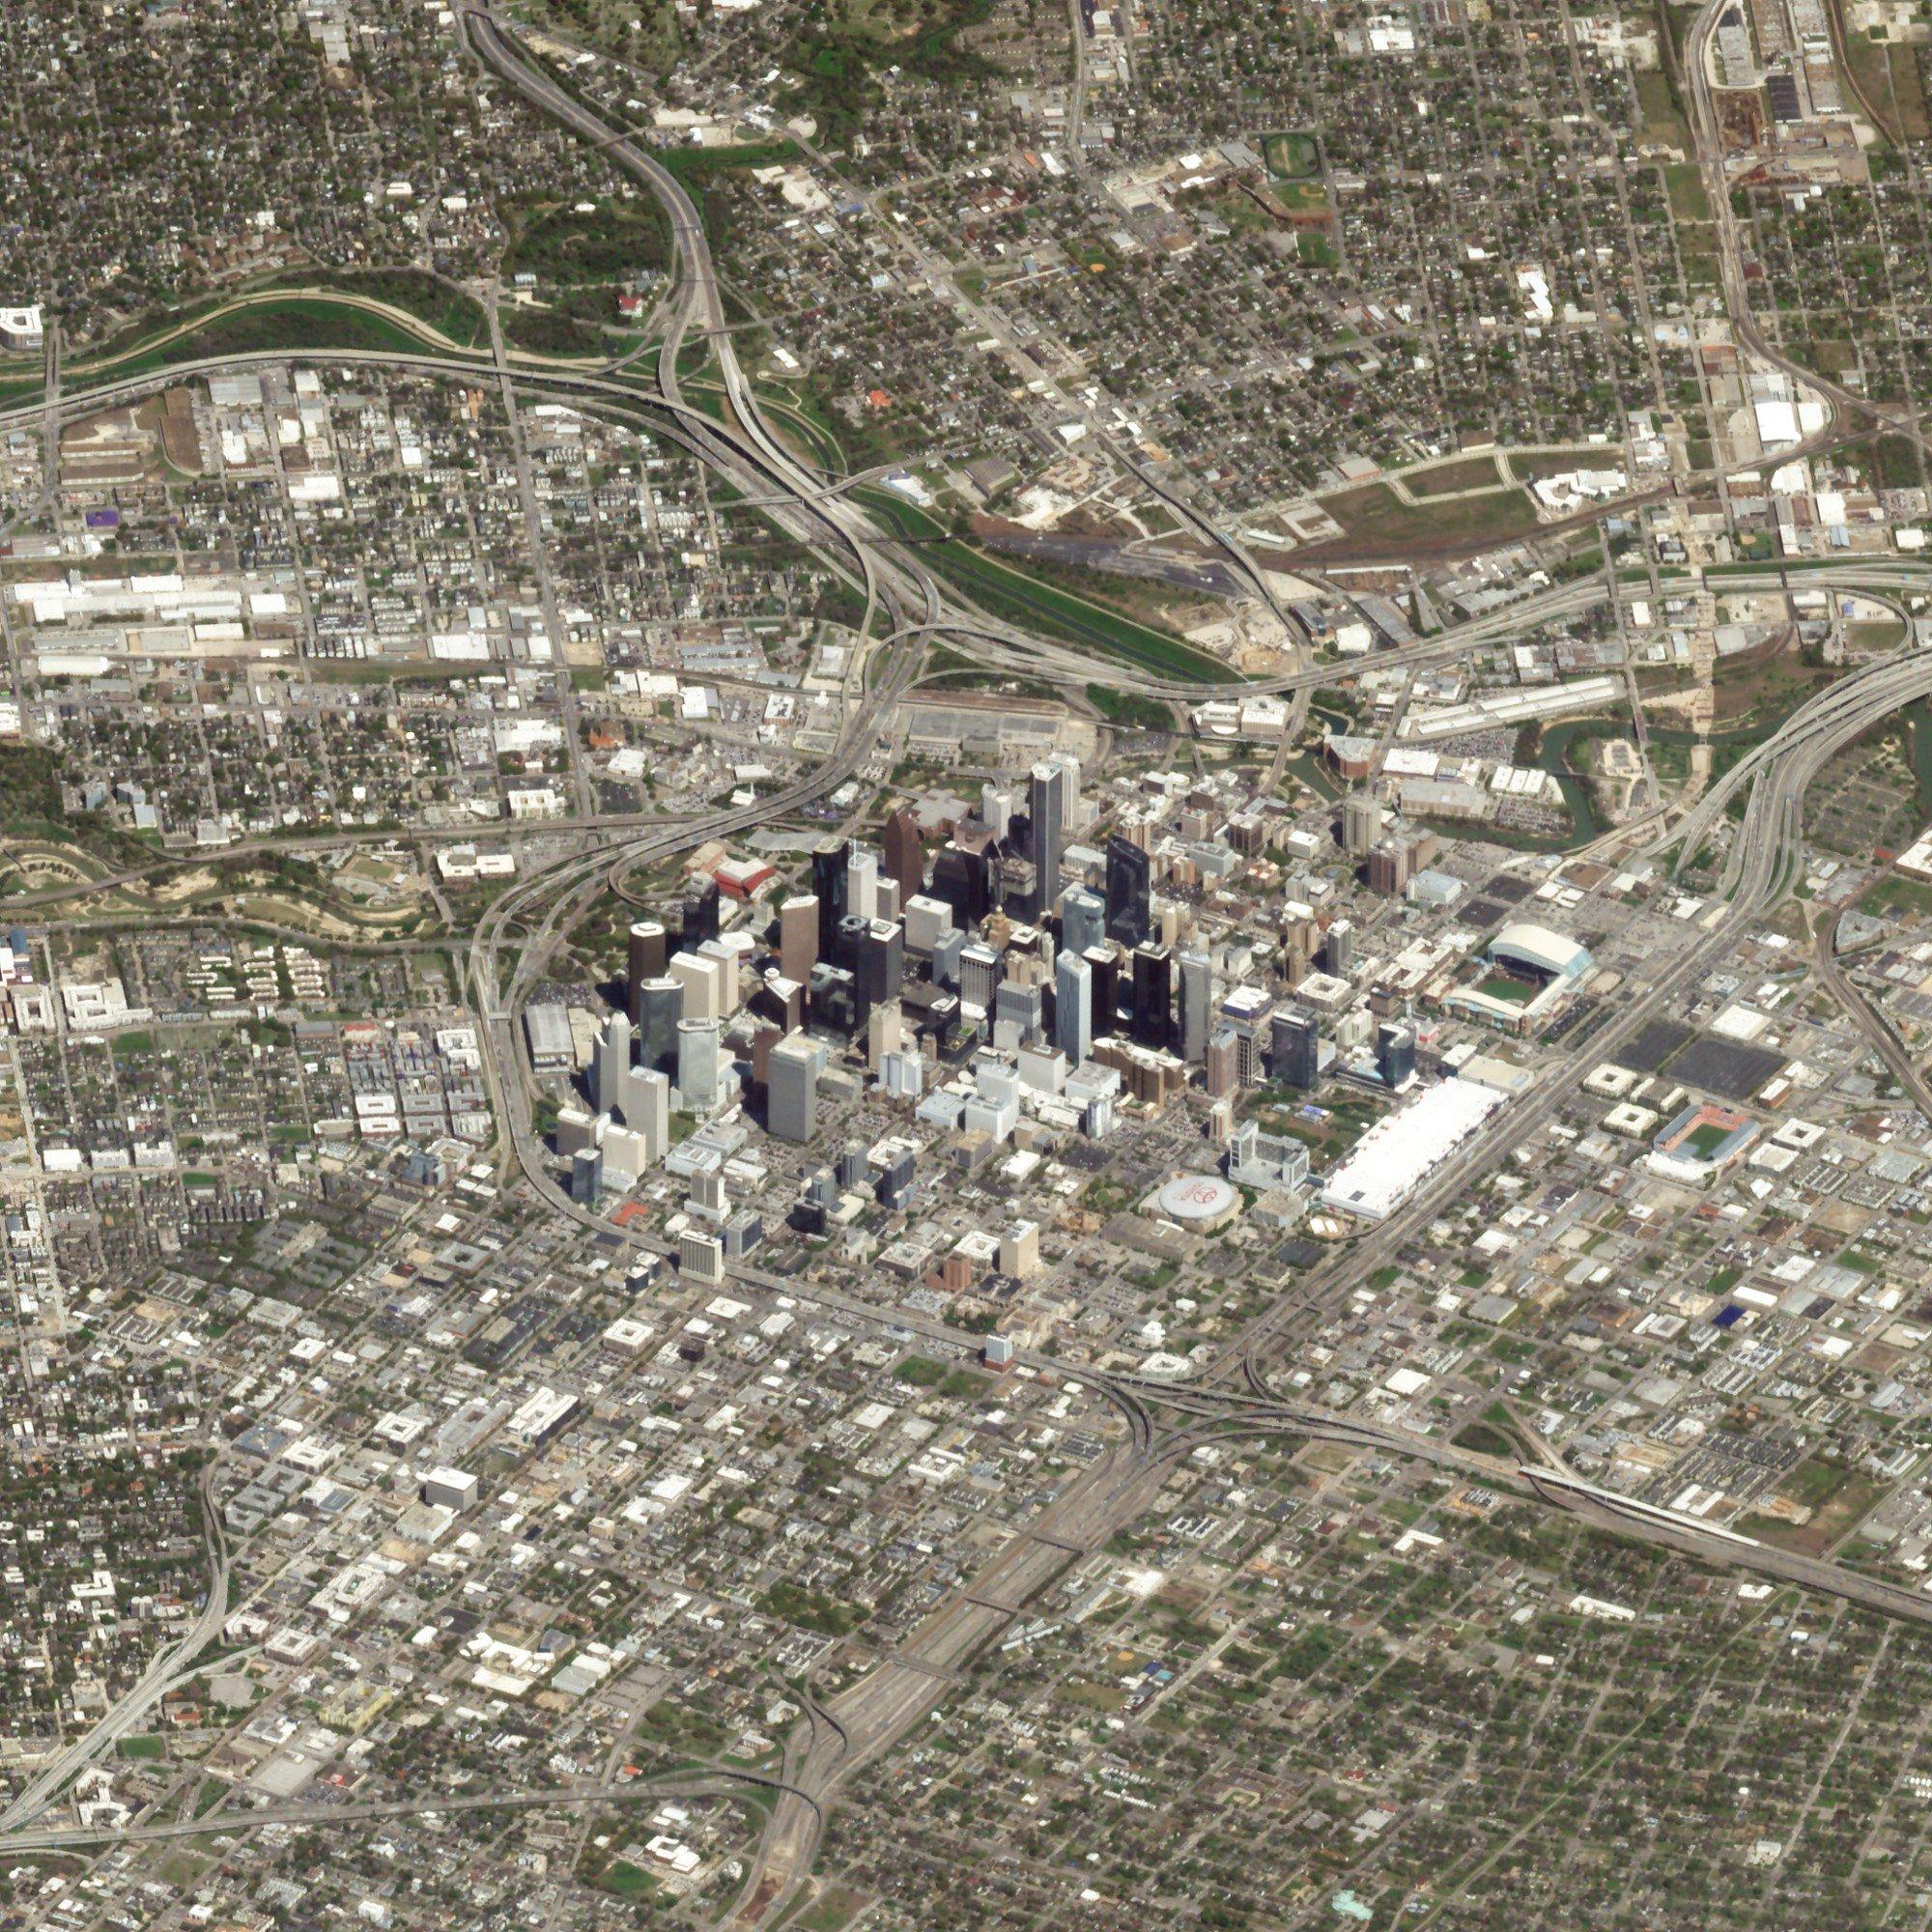 Houston, Texas. March 14, 2018. Image ©2018 Planet Labs, Inc. cc-by-sa4.0.